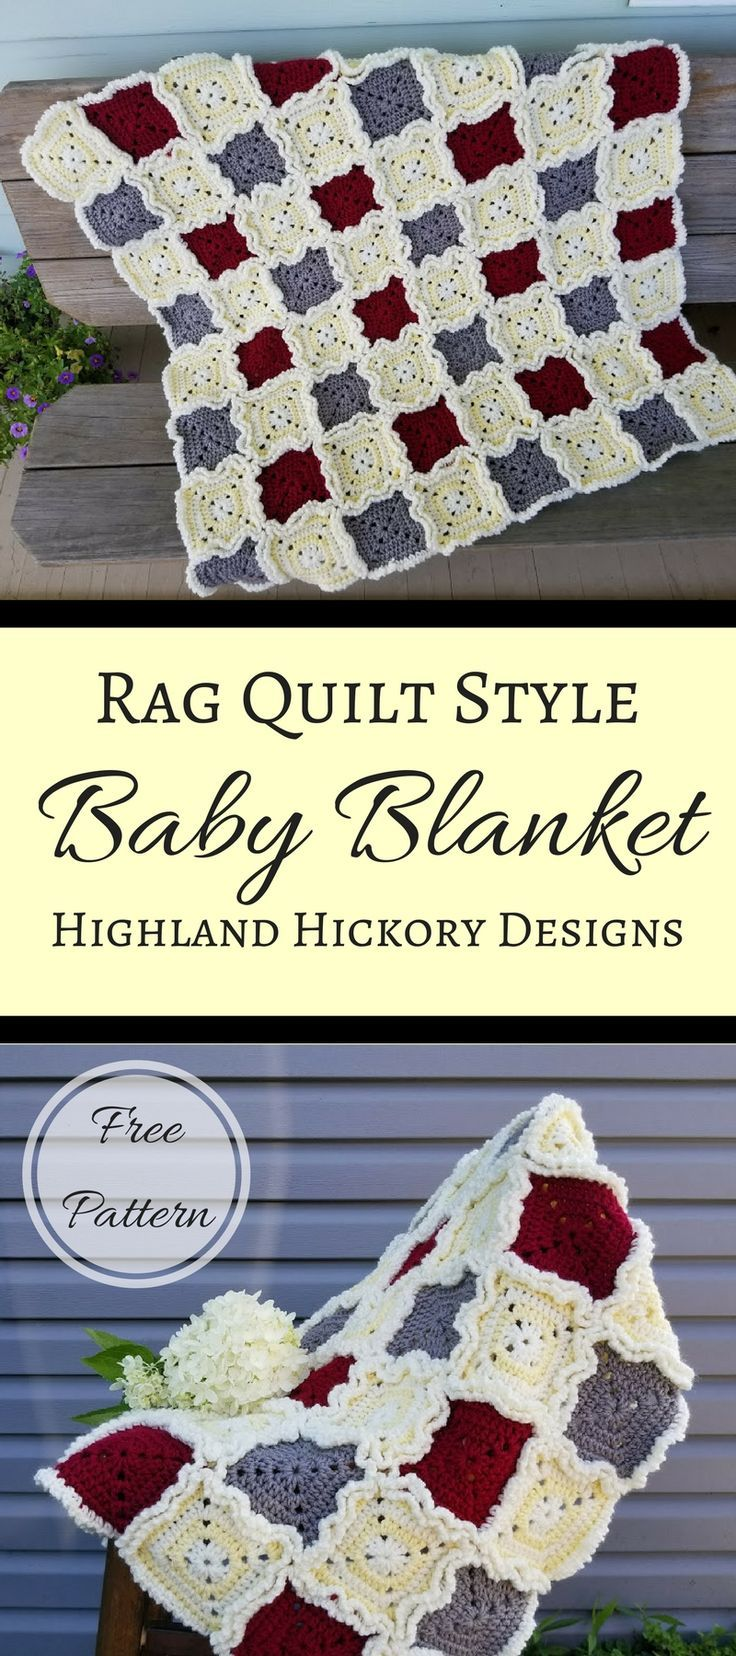 rag quilt free baby blanket pattern.